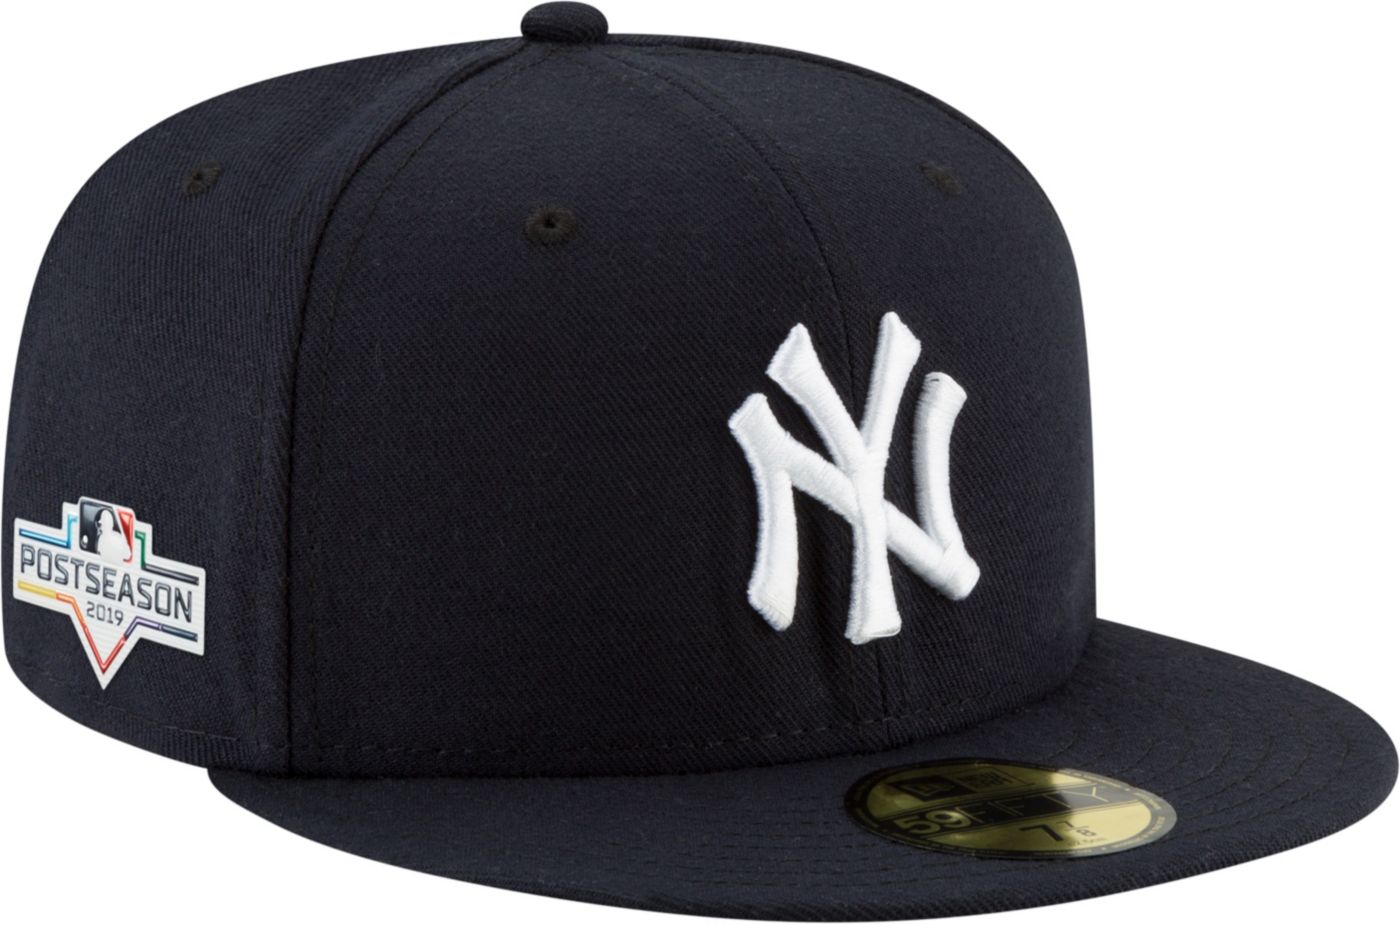 New Era Men's New York Yankees 59Fifty 2019 MLB Postseason Authentic Hat